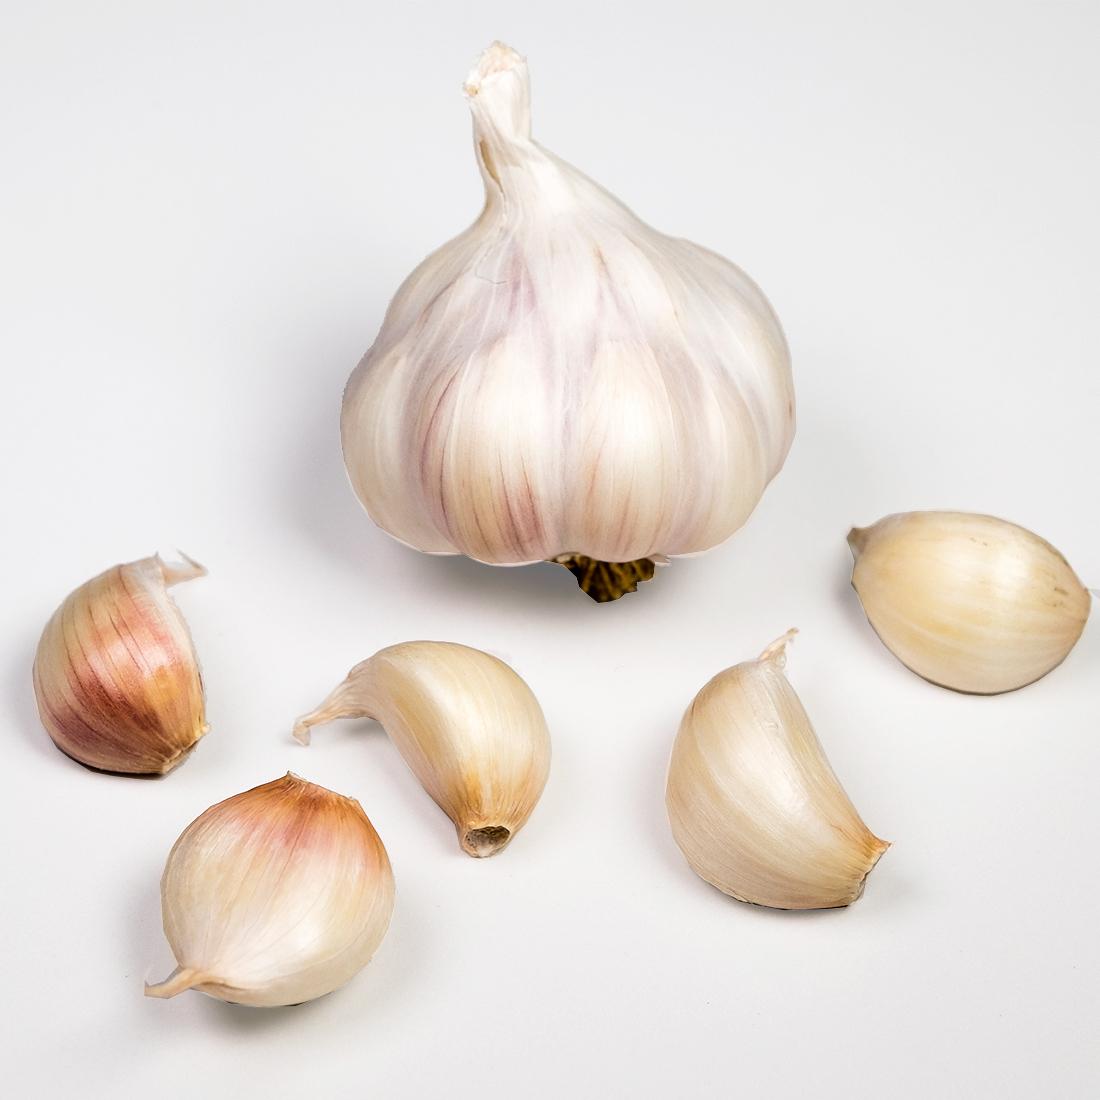 Planting garlic in 2019: calendar 88